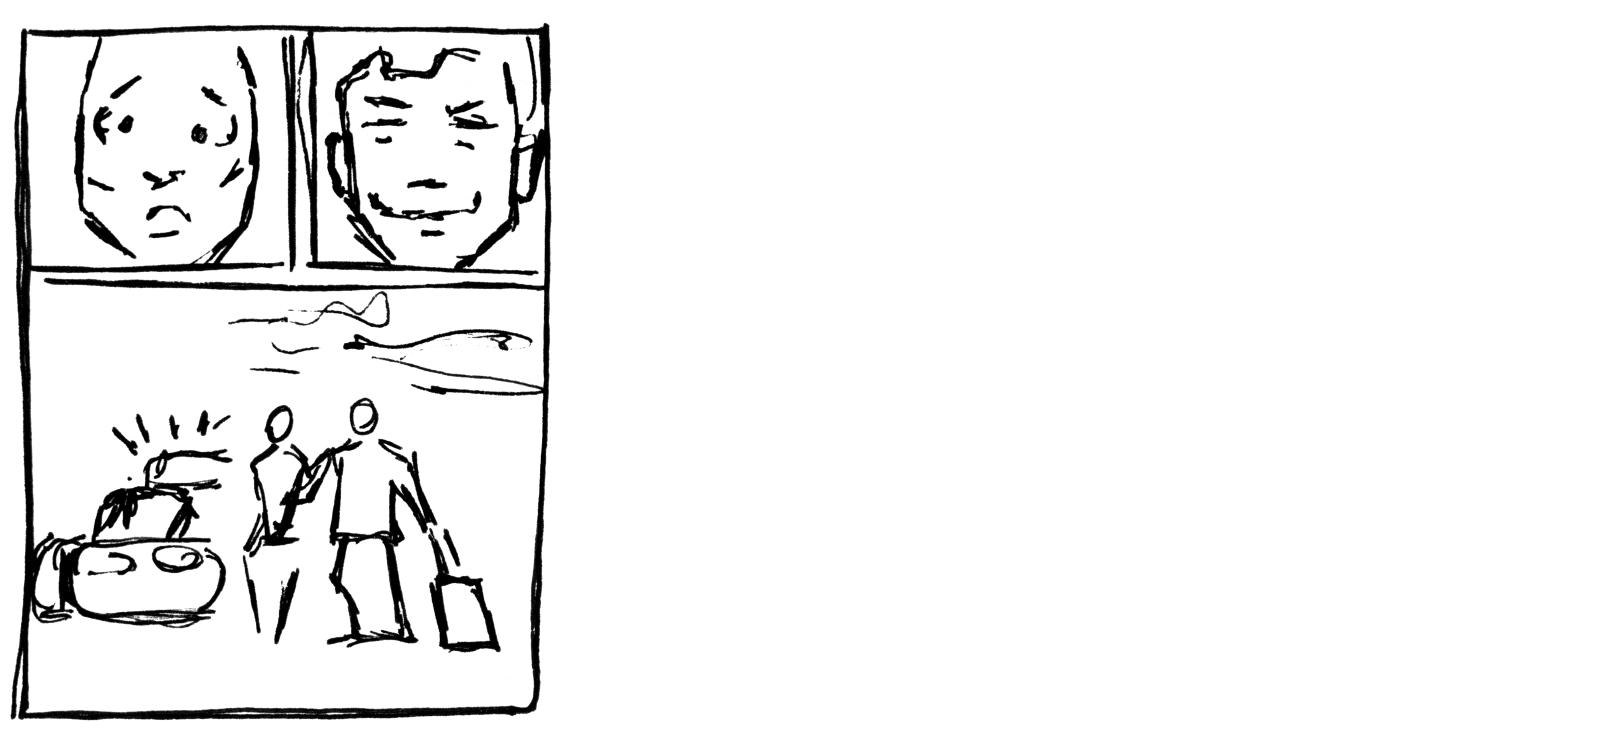 Final thumbnails for a script page